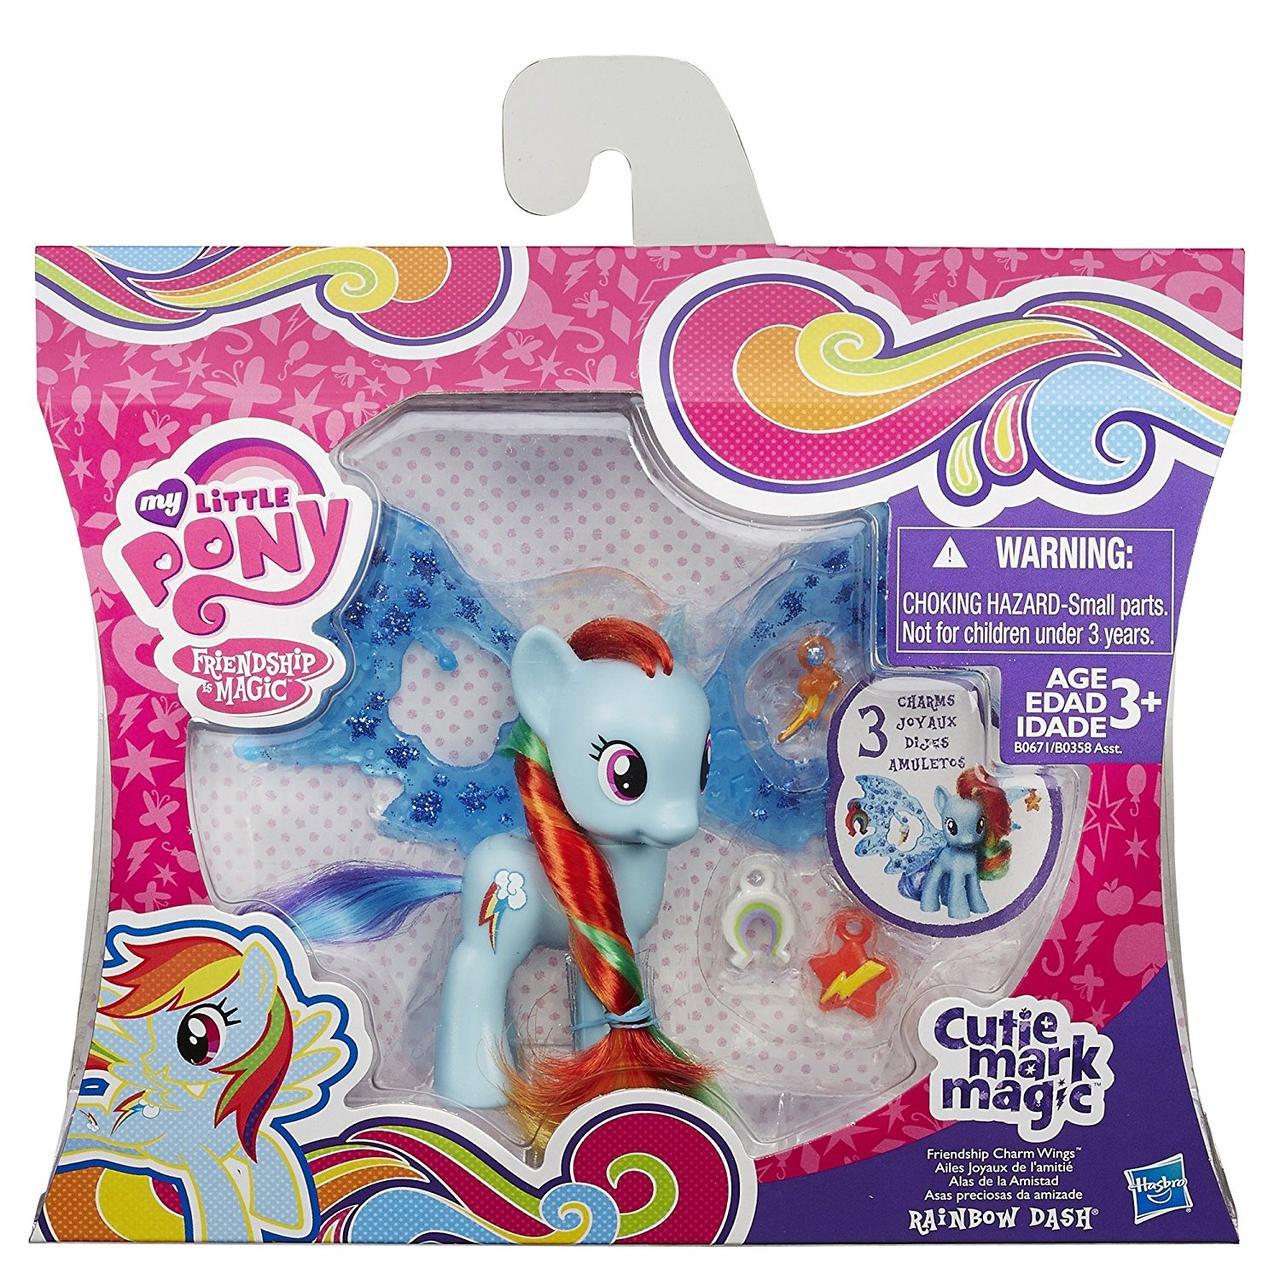 Фигурка пони Рейнбоу Деш, Крылья дружбы - Rainbow Dash, My Little Pony, Friendship Charm Wings, Hasbro